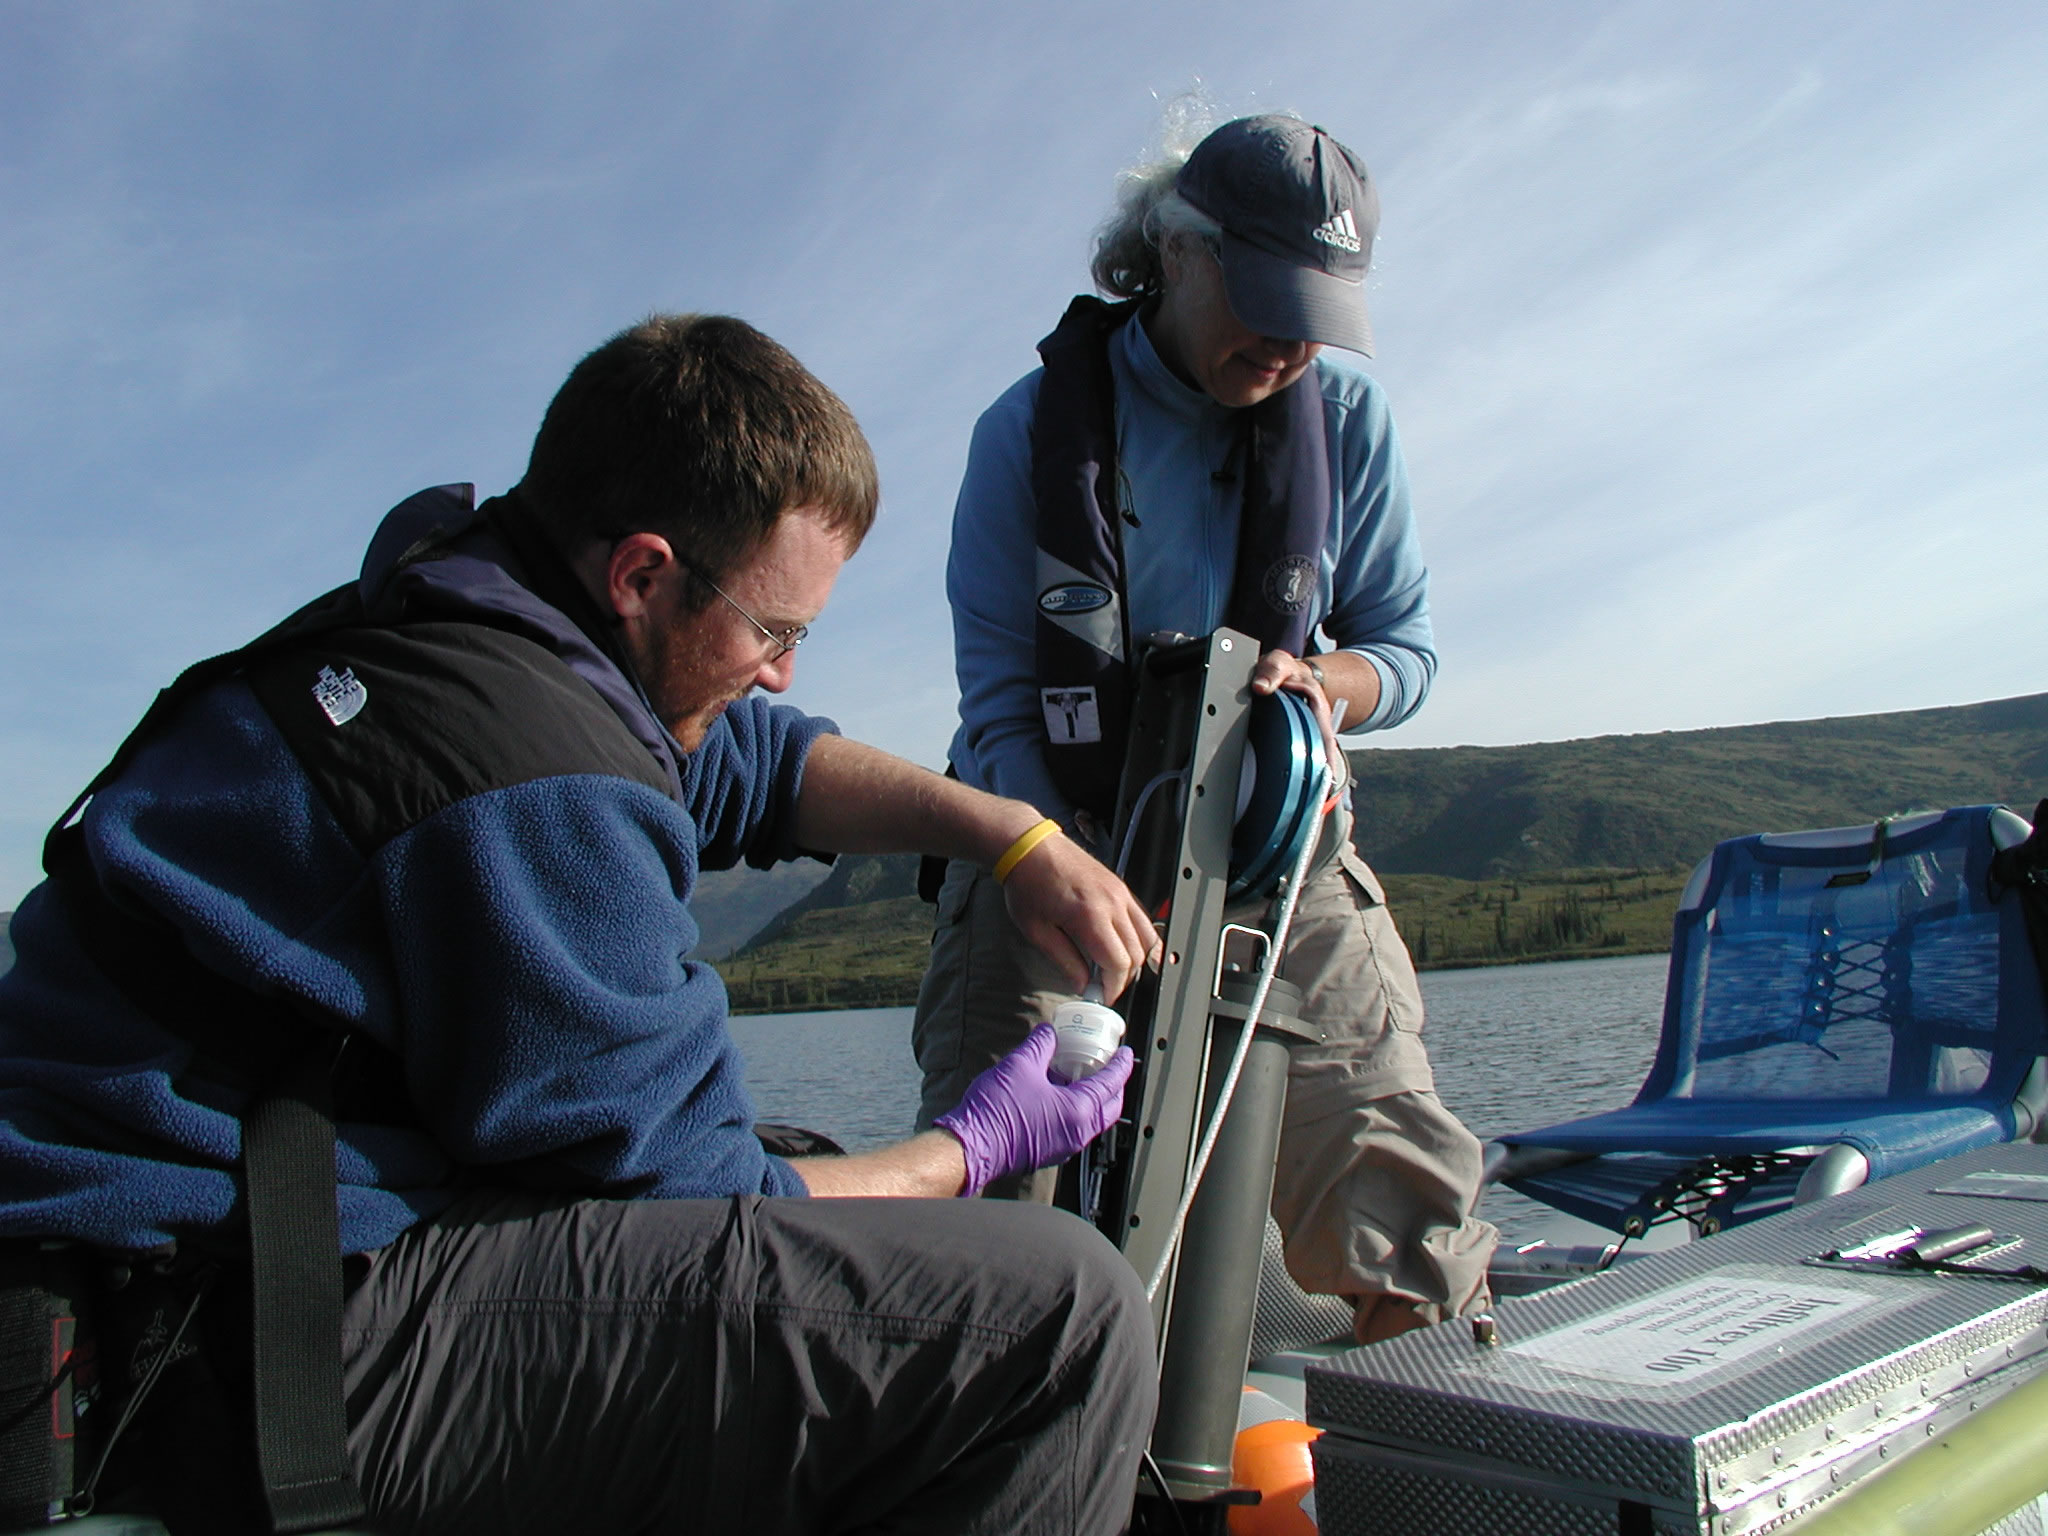 Sample collection from Denali National Park and Preserve, Alaska.